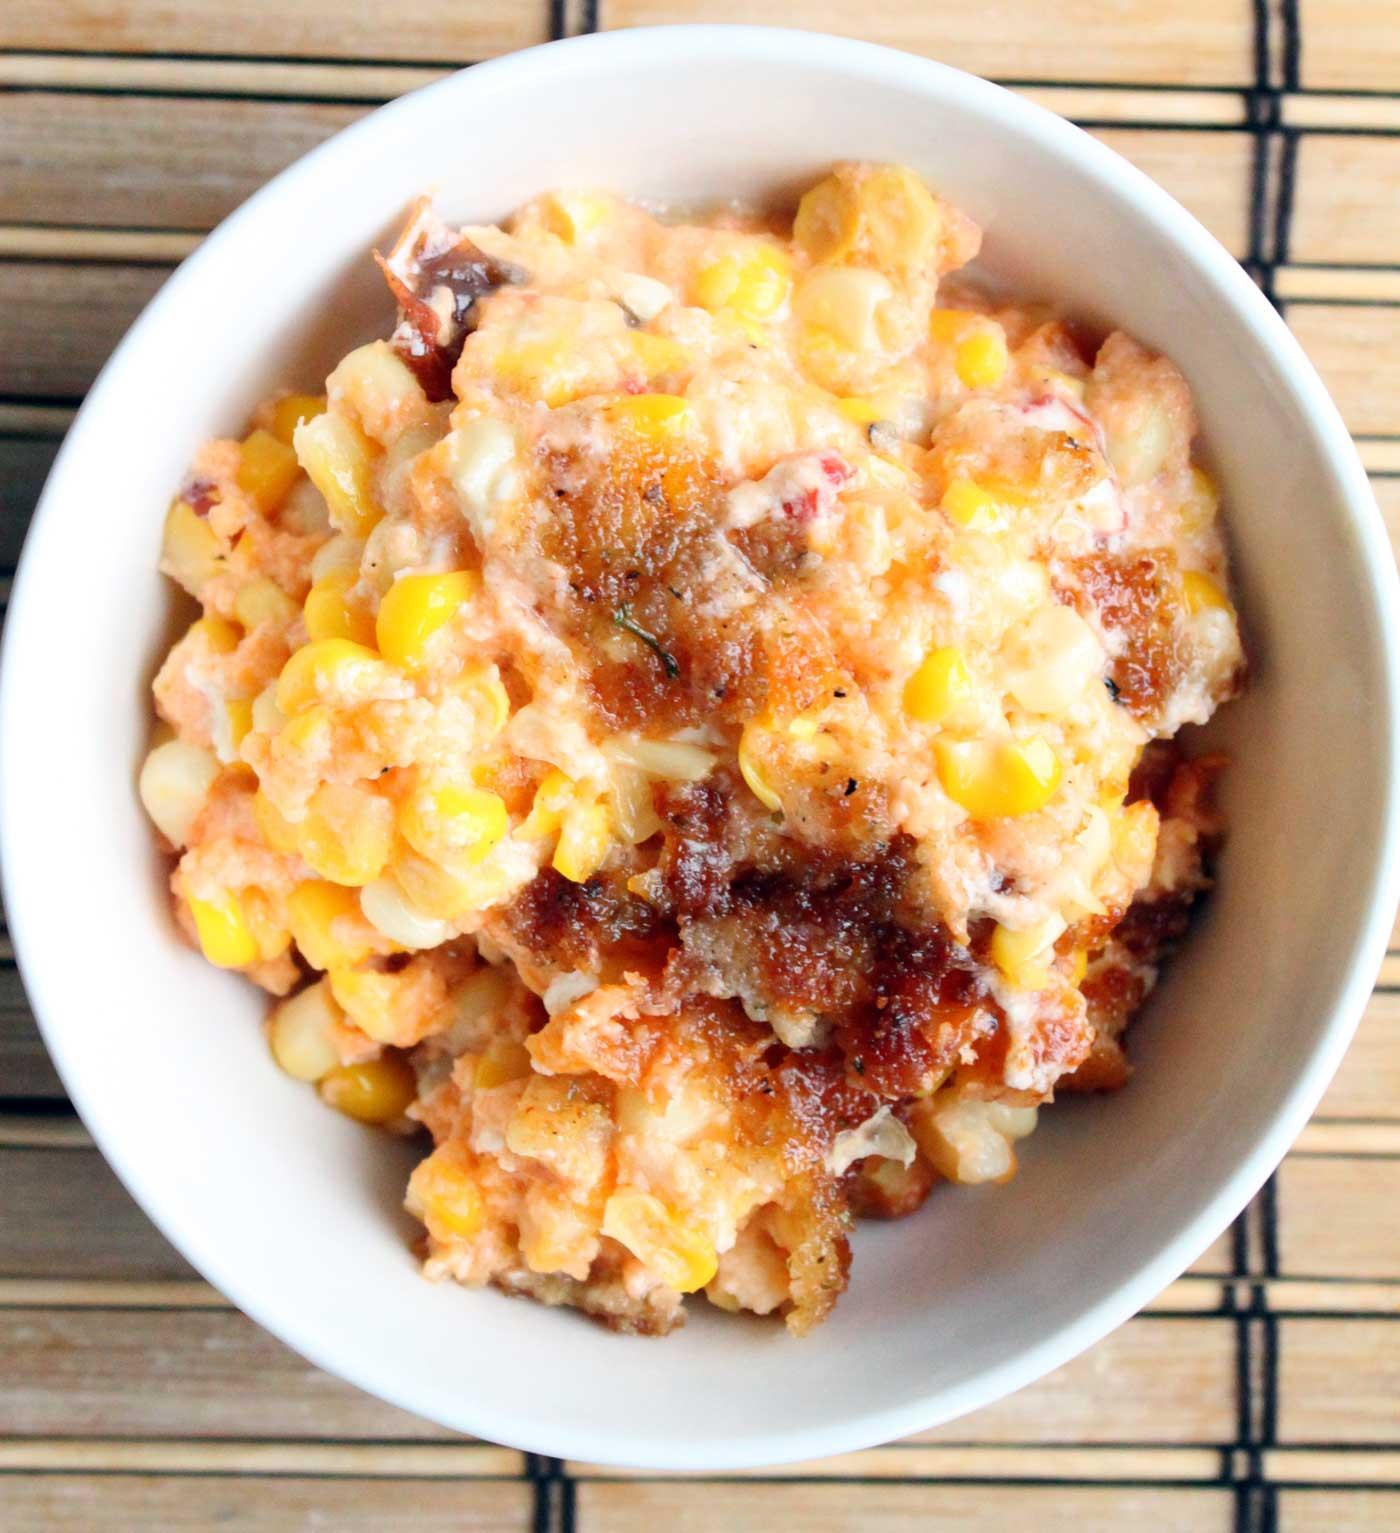 Corn Casserole Recipes  Cheesy Corn Casserole – Simple fort Food – Recipes that